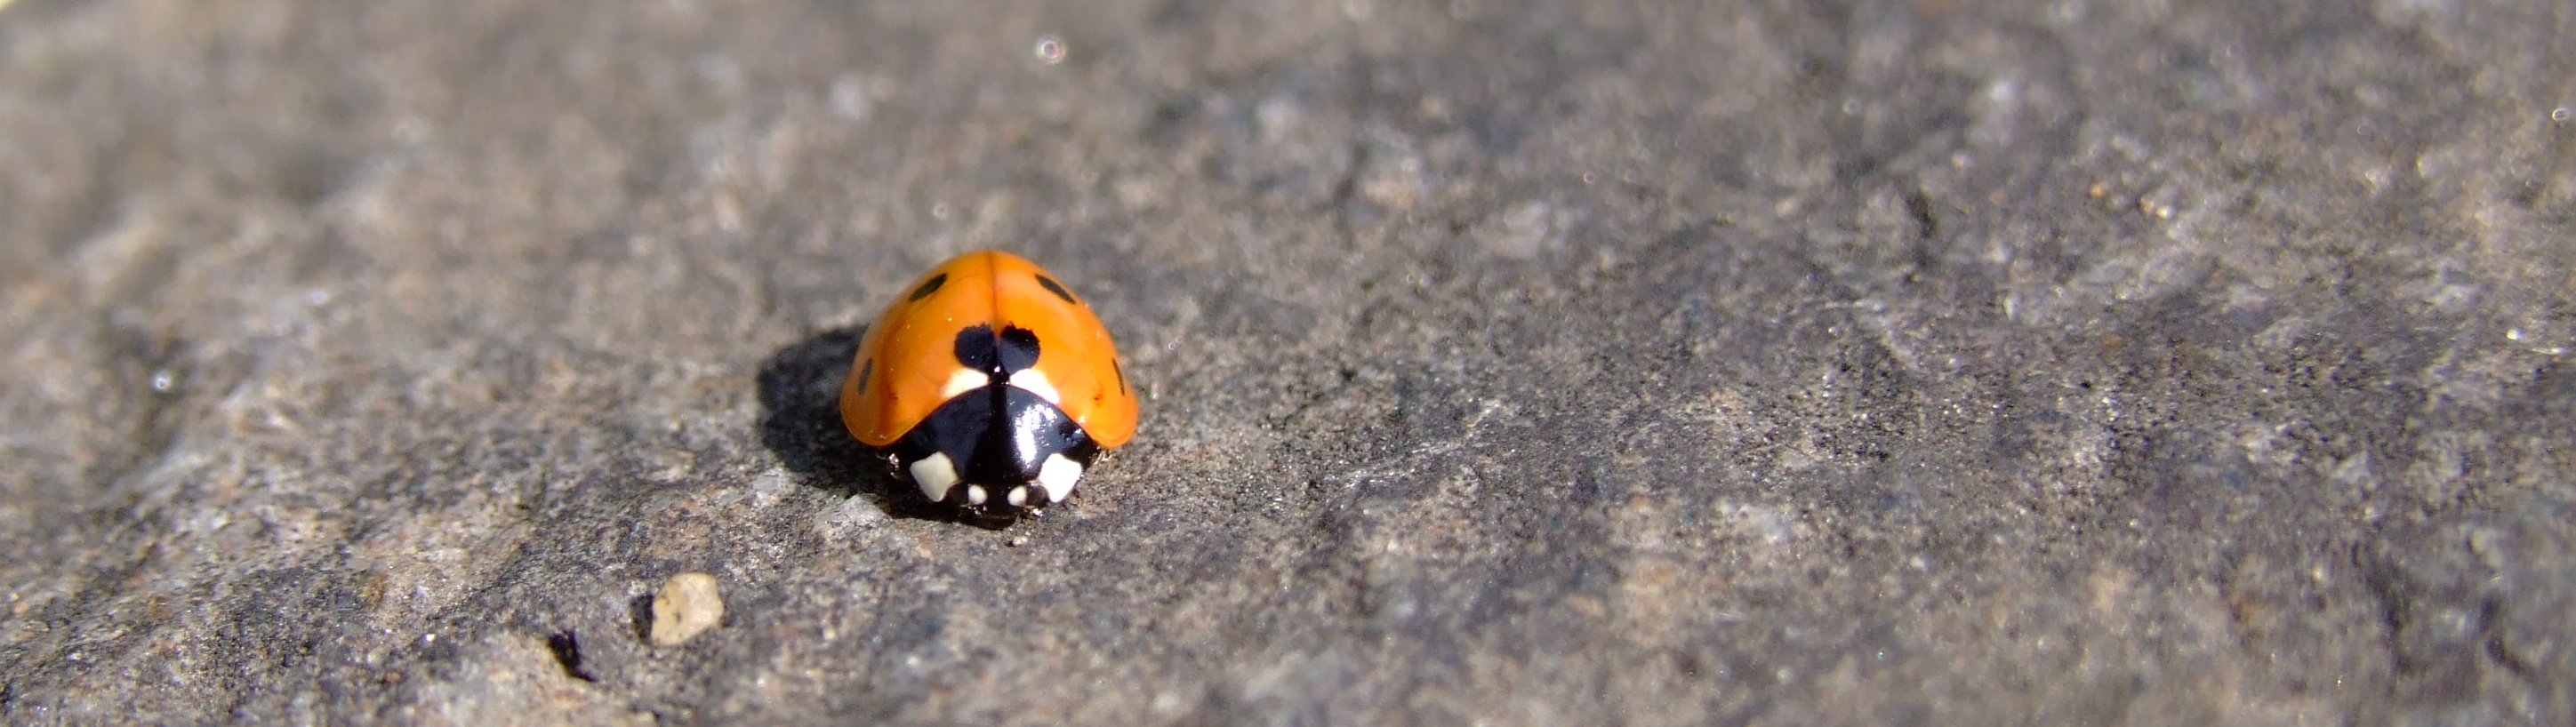 File:Ladybird (3721026194).jpg - Wikimedia Commons